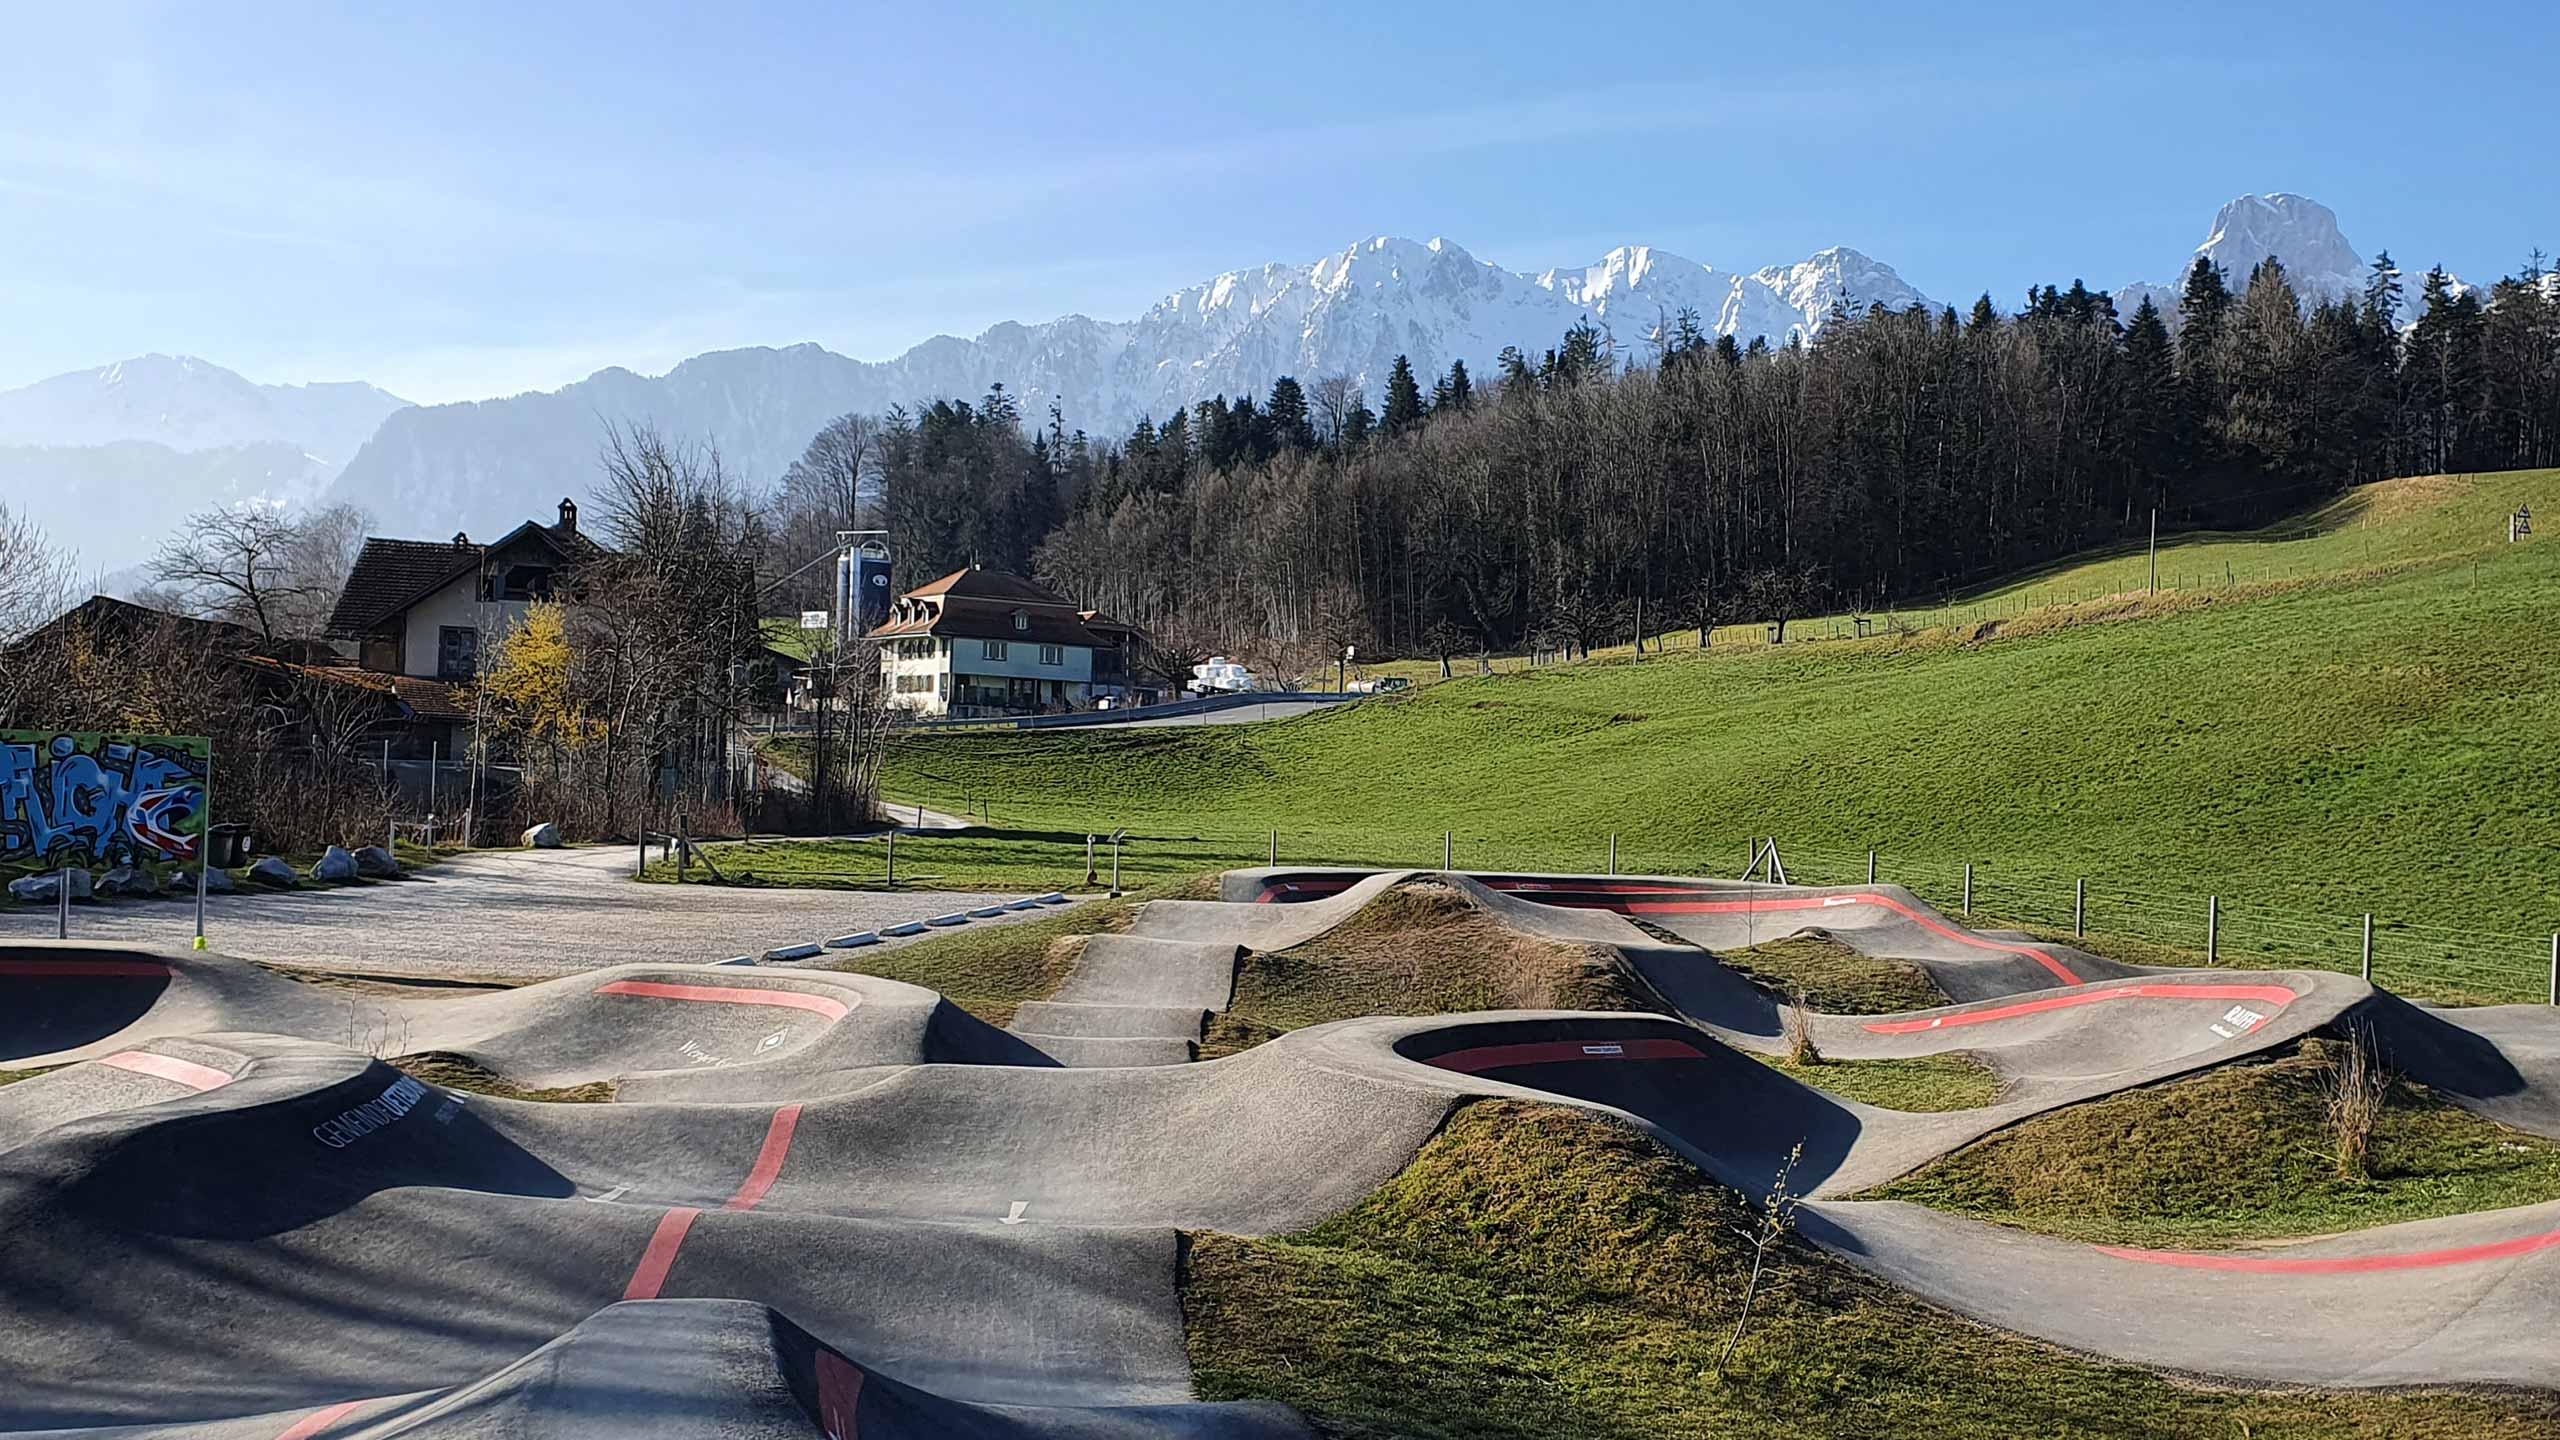 pumptrack-tierachern-bergkette-stockhorn-gras-fruehling.jpg